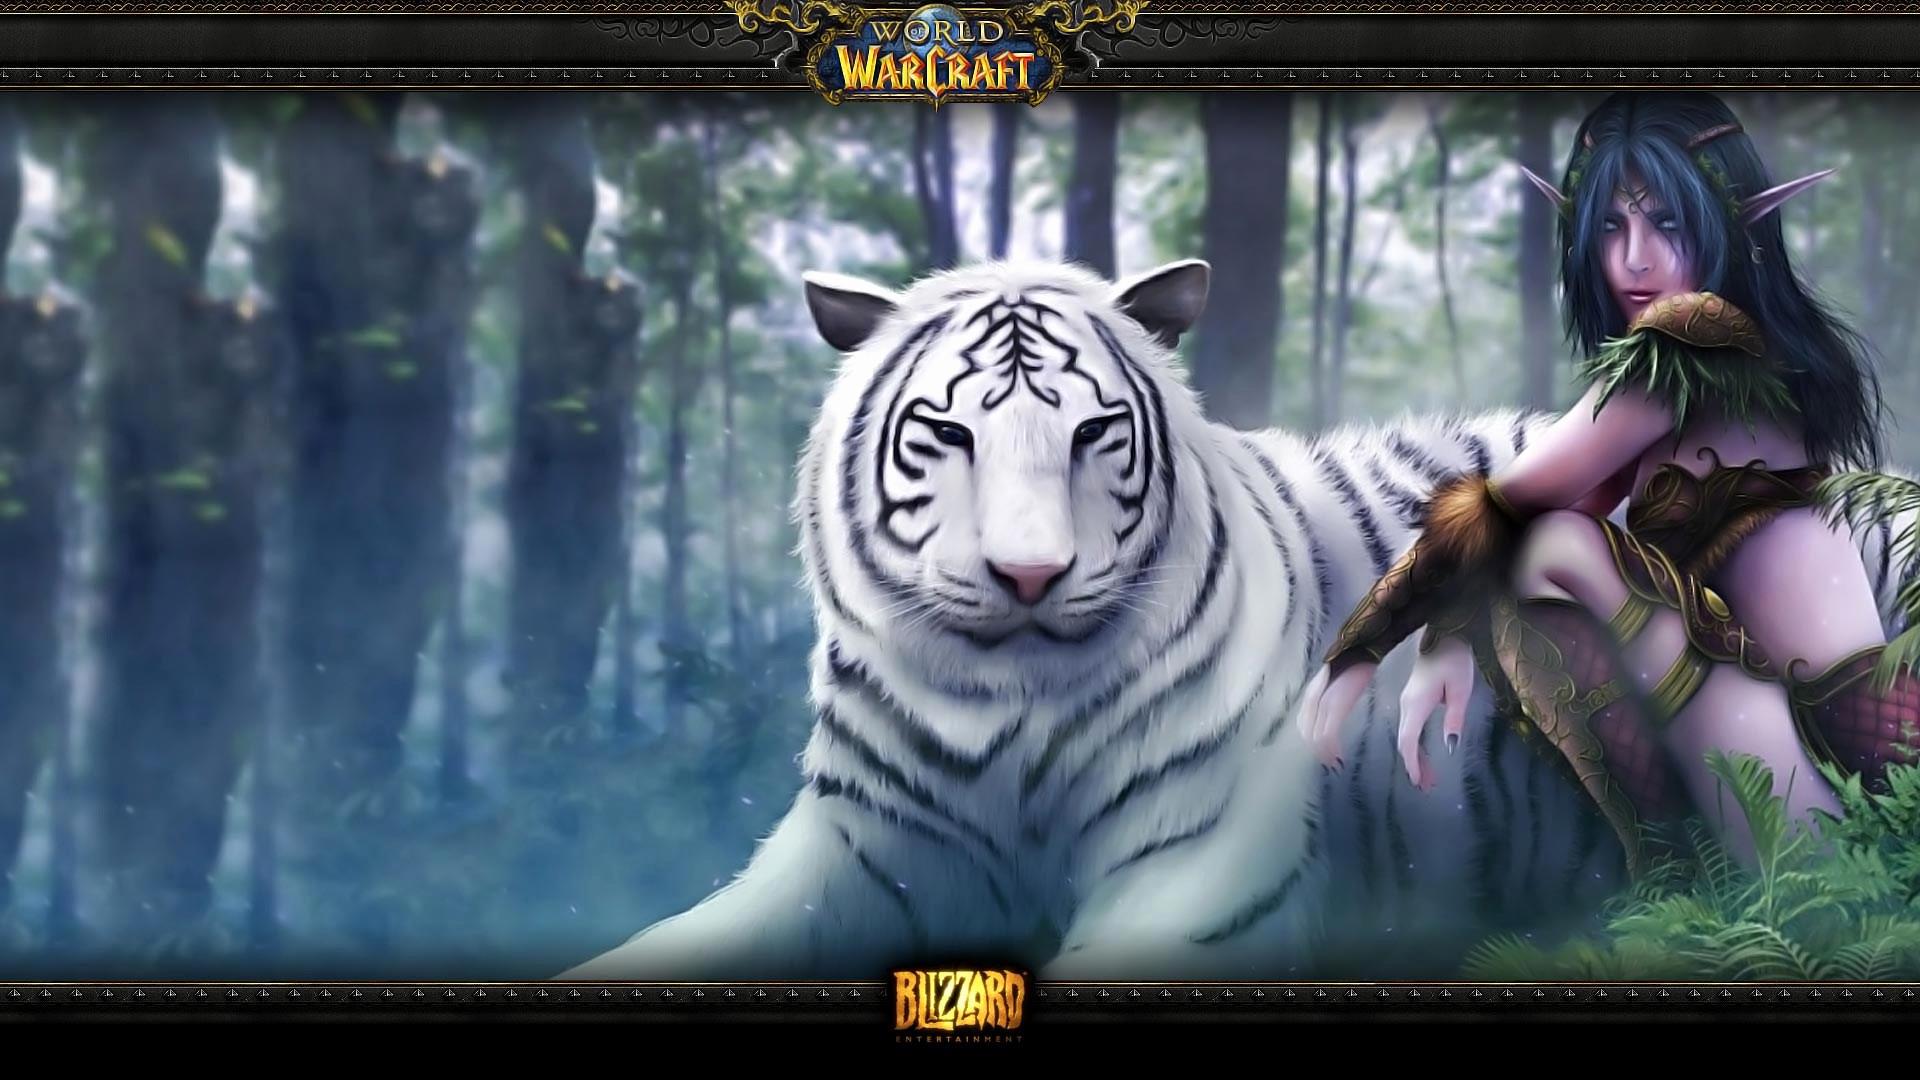 Res: 1920x1080, Duck Dynasty Wallpaper Beautiful Tiger Girl for Mac Likeagod Pinterest